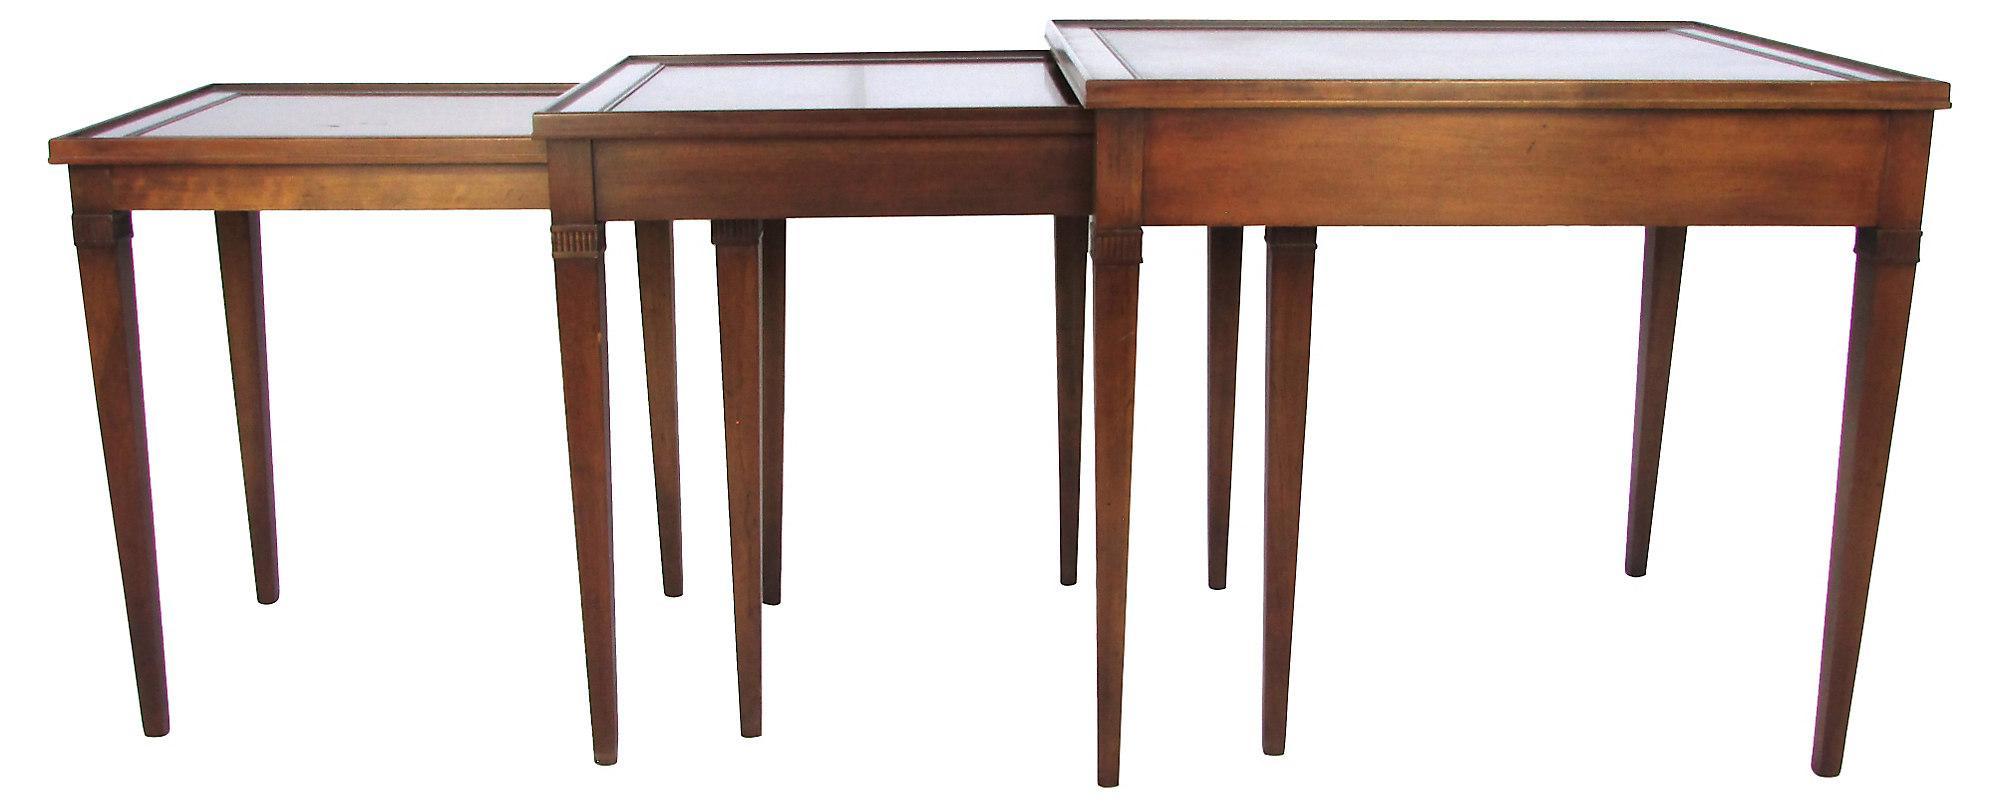 Good Image Of Regency Style Mahogany Nesting Tables   Set Of 3